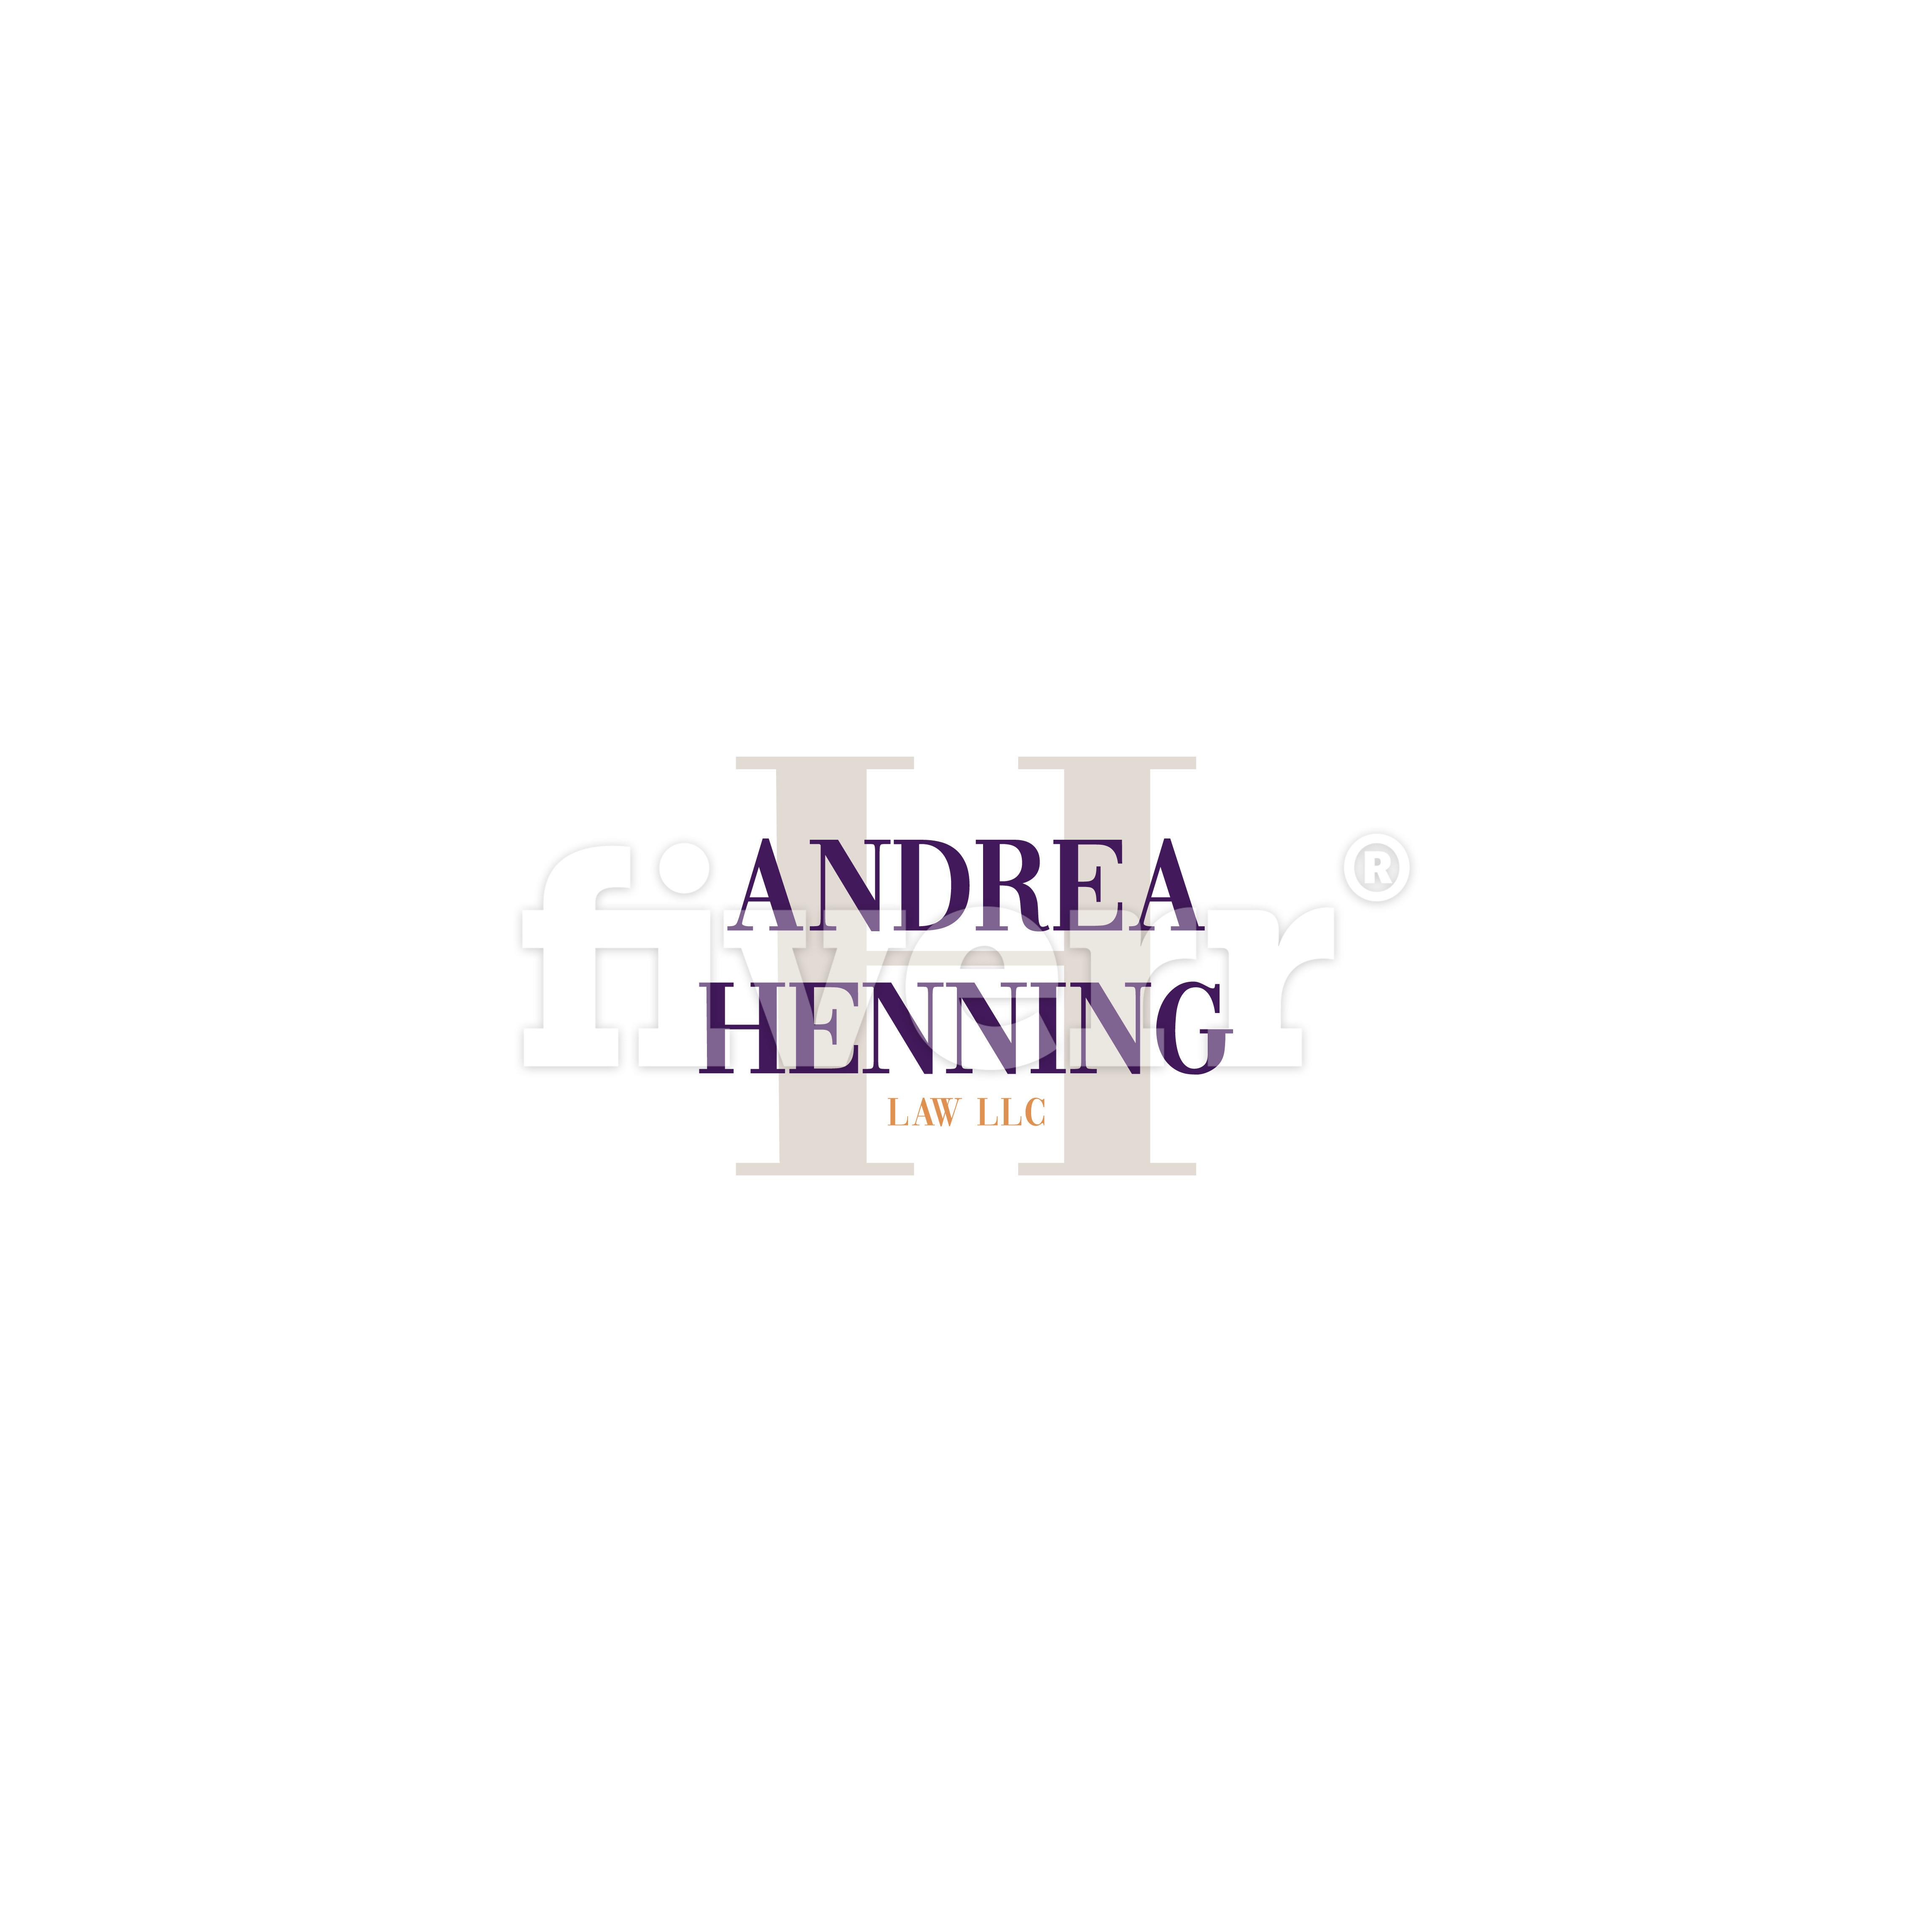 Andrea Henning Law LLC image 0